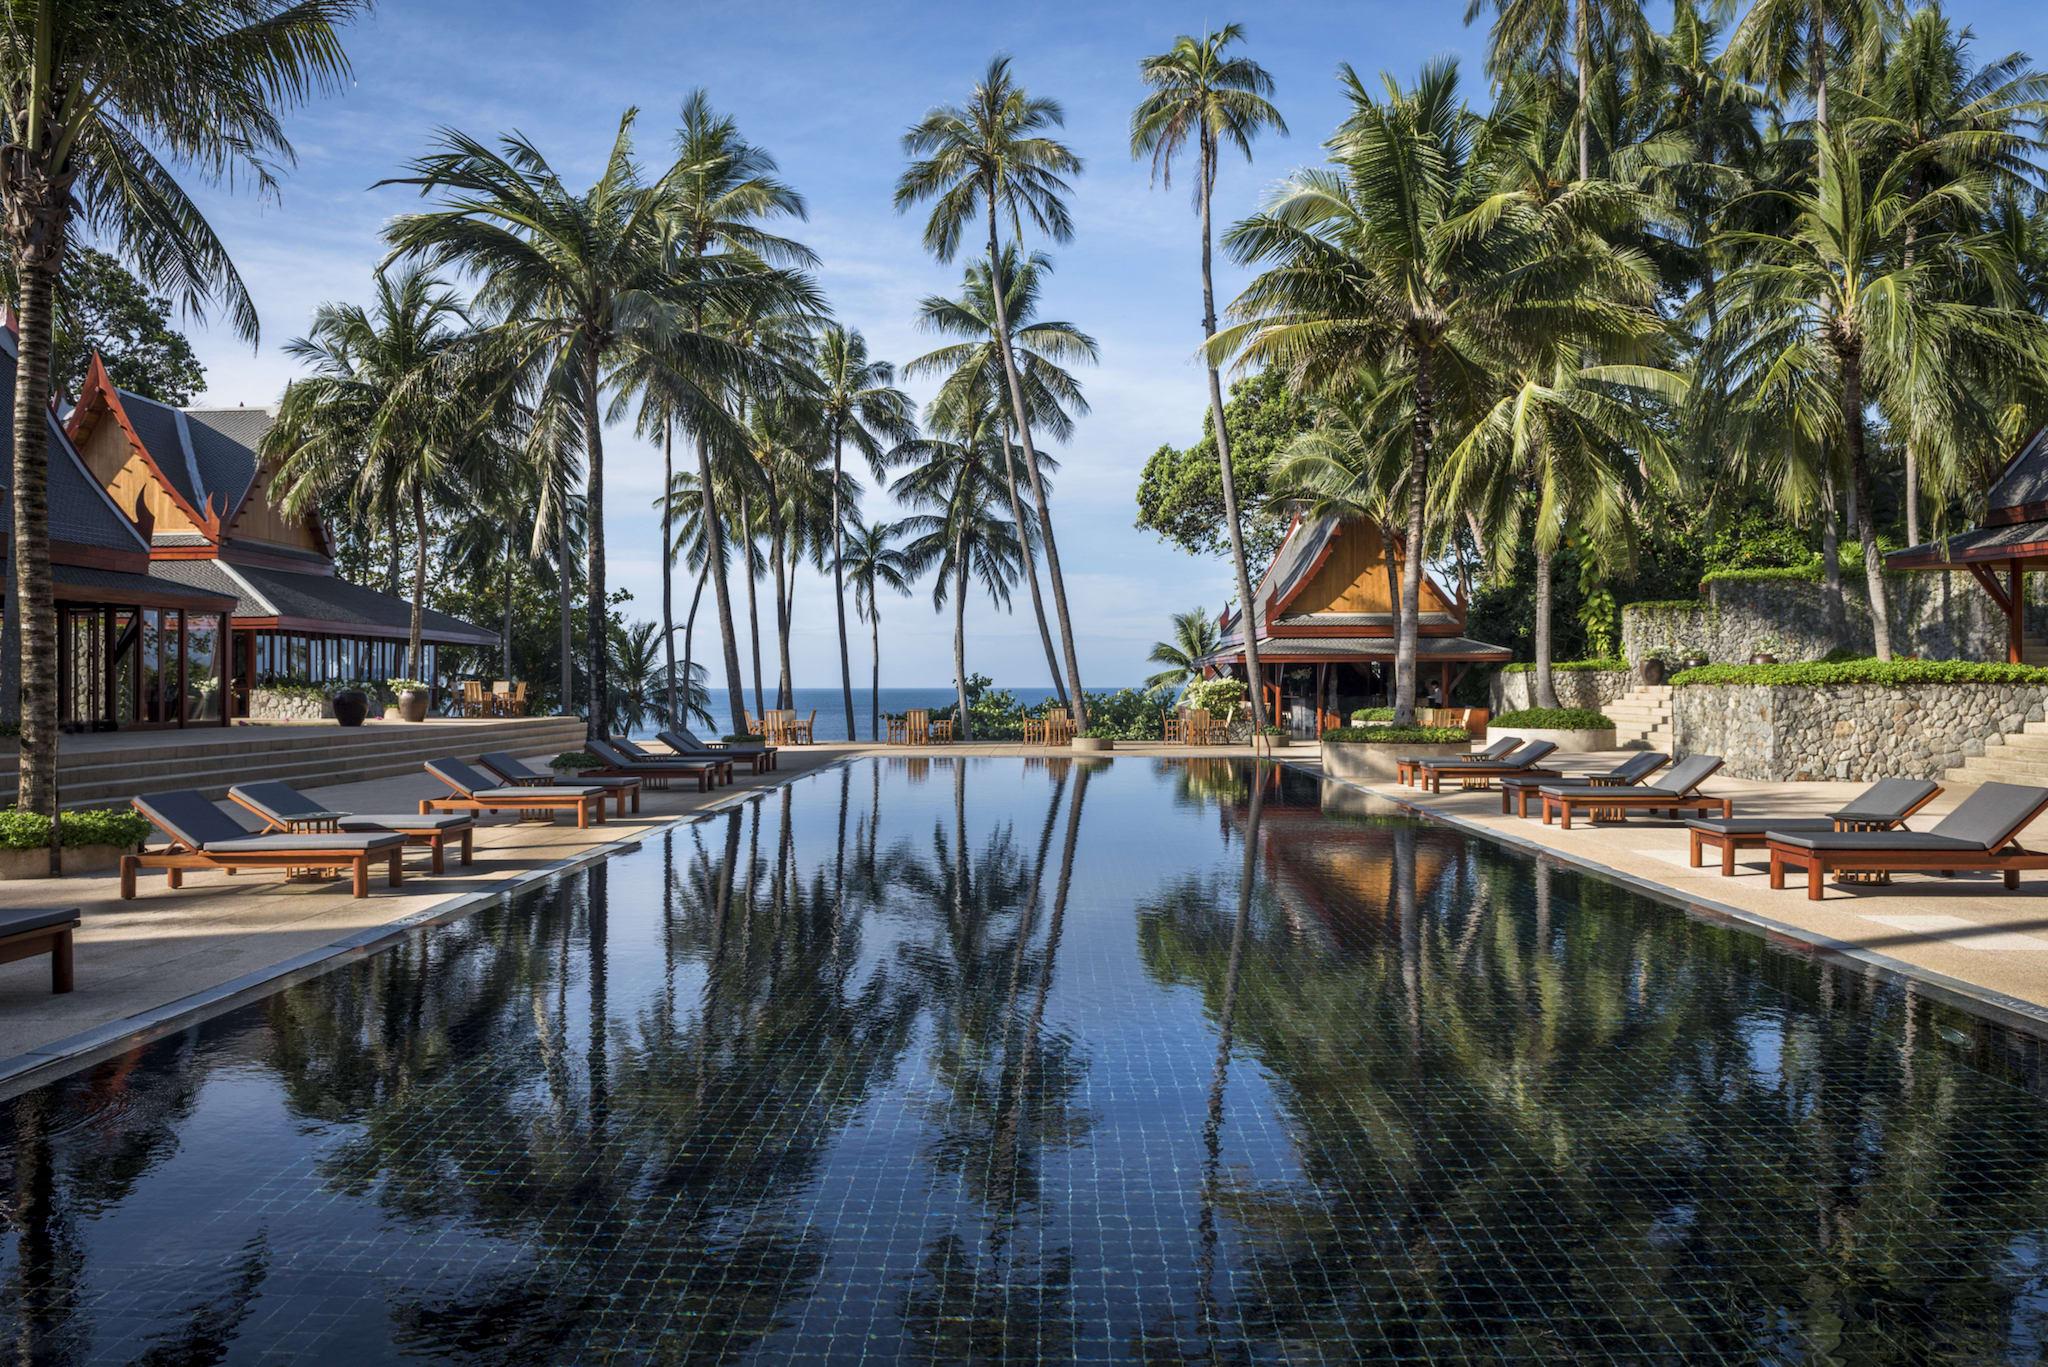 10 luxury wellness resorts across Asia for detox retreats